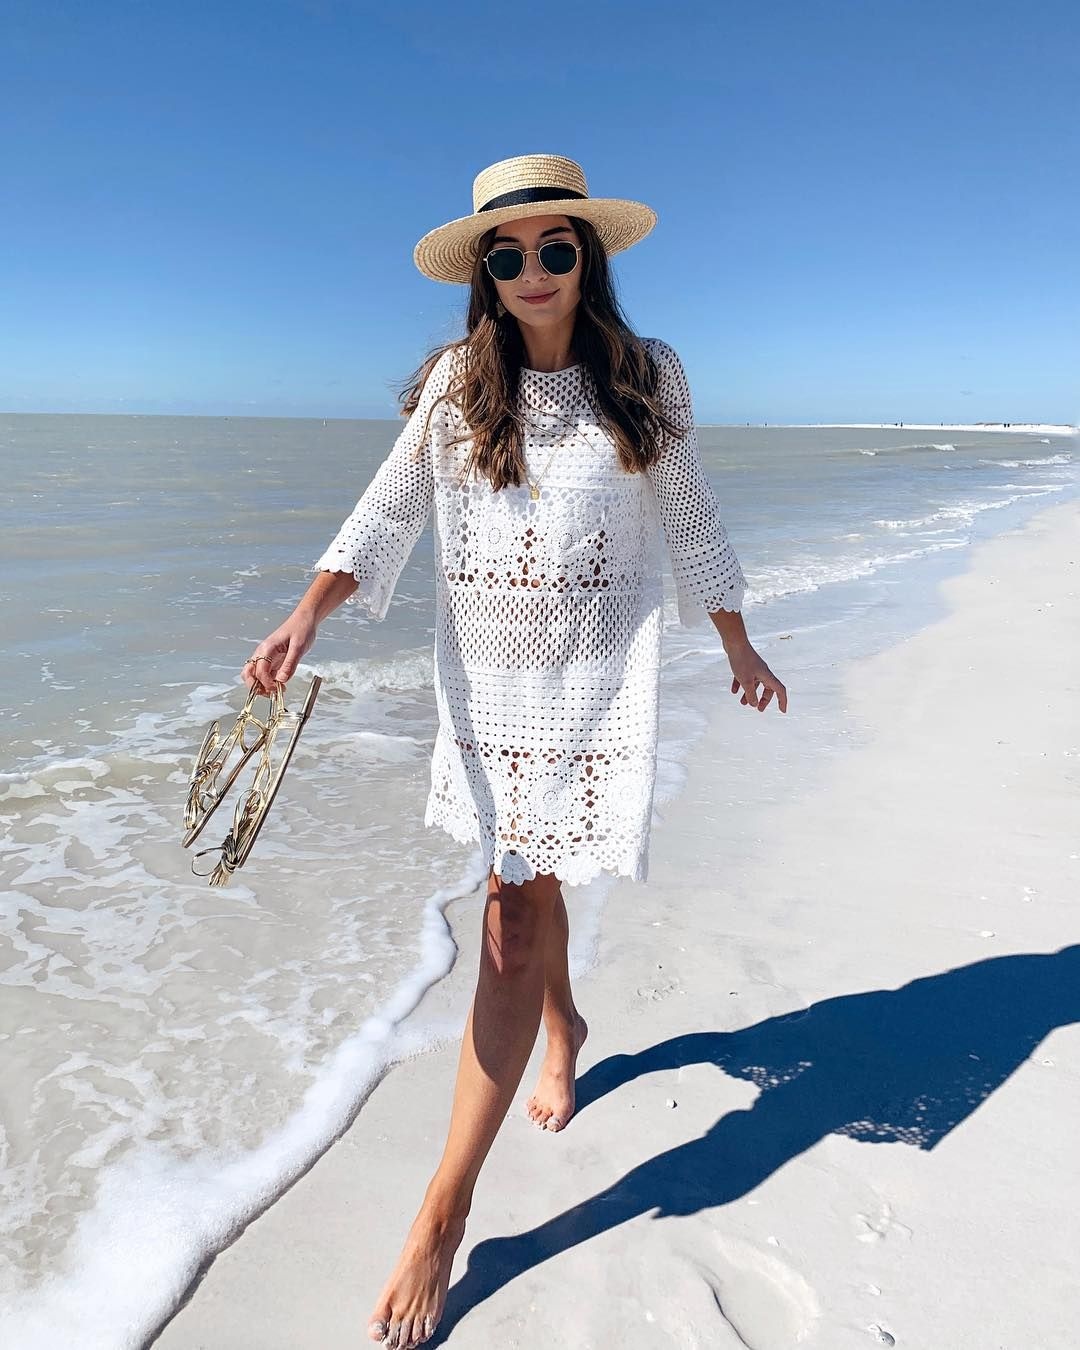 25fe75648d White crochet beach cover up by Lulus #beachbabe #beachbum #beachstyle # beachcoverup #beachlook #vacayoutfit #vacaystyle #vacayoutfits  #vacayfashion ...